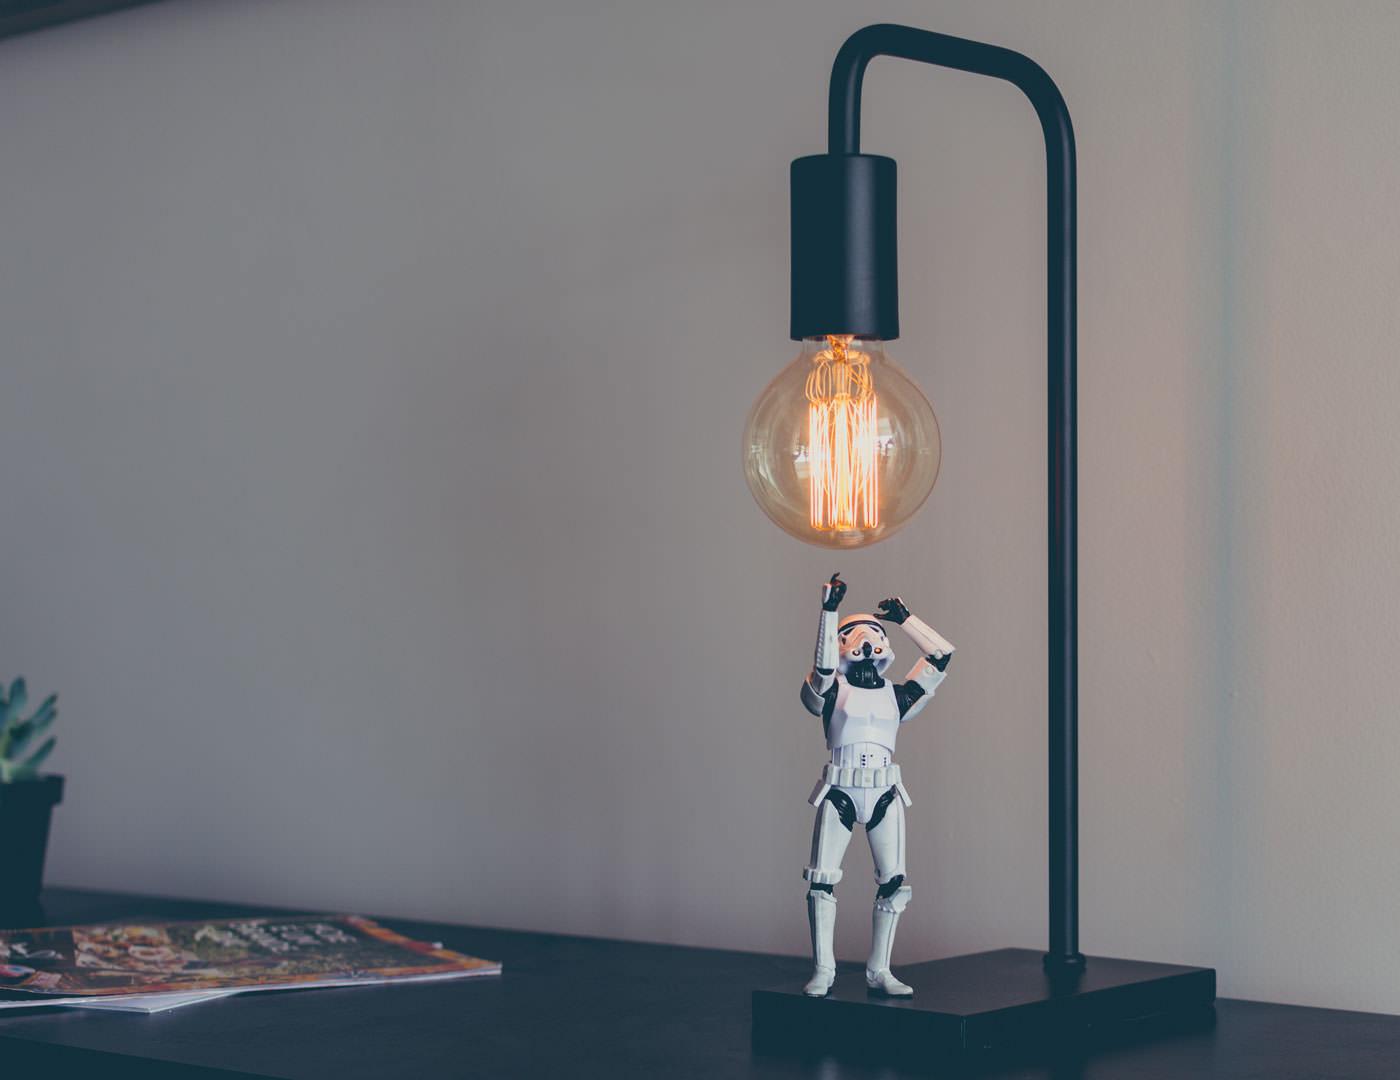 Stormtrooper under lightbulb